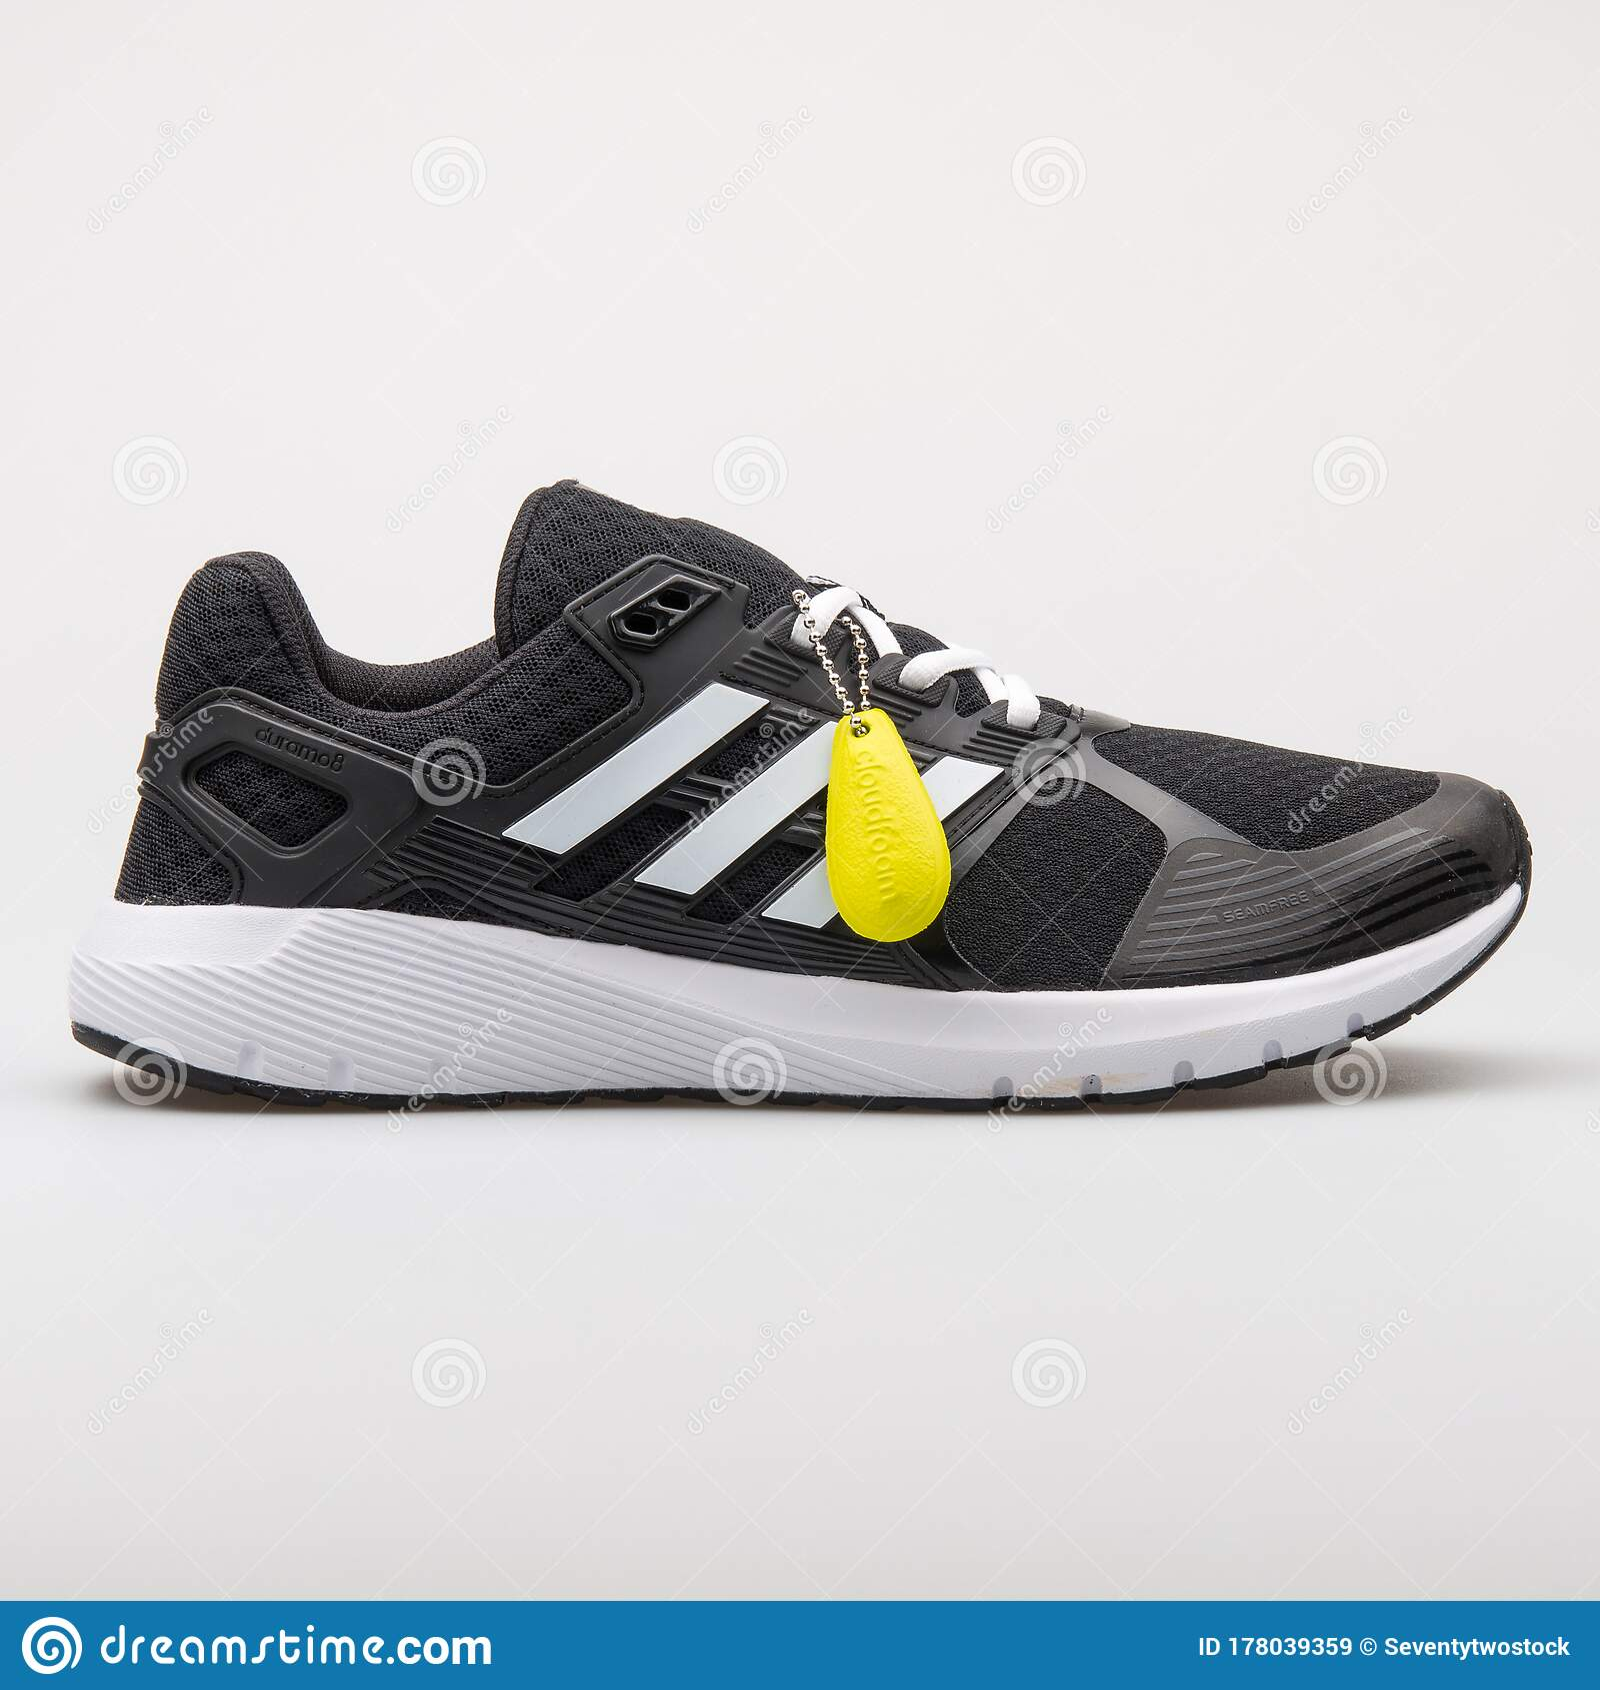 Labe Destructivo filete  Adidas Duramo 8 Black And White Sneaker Editorial Stock Image - Image of  life, leather: 178039359